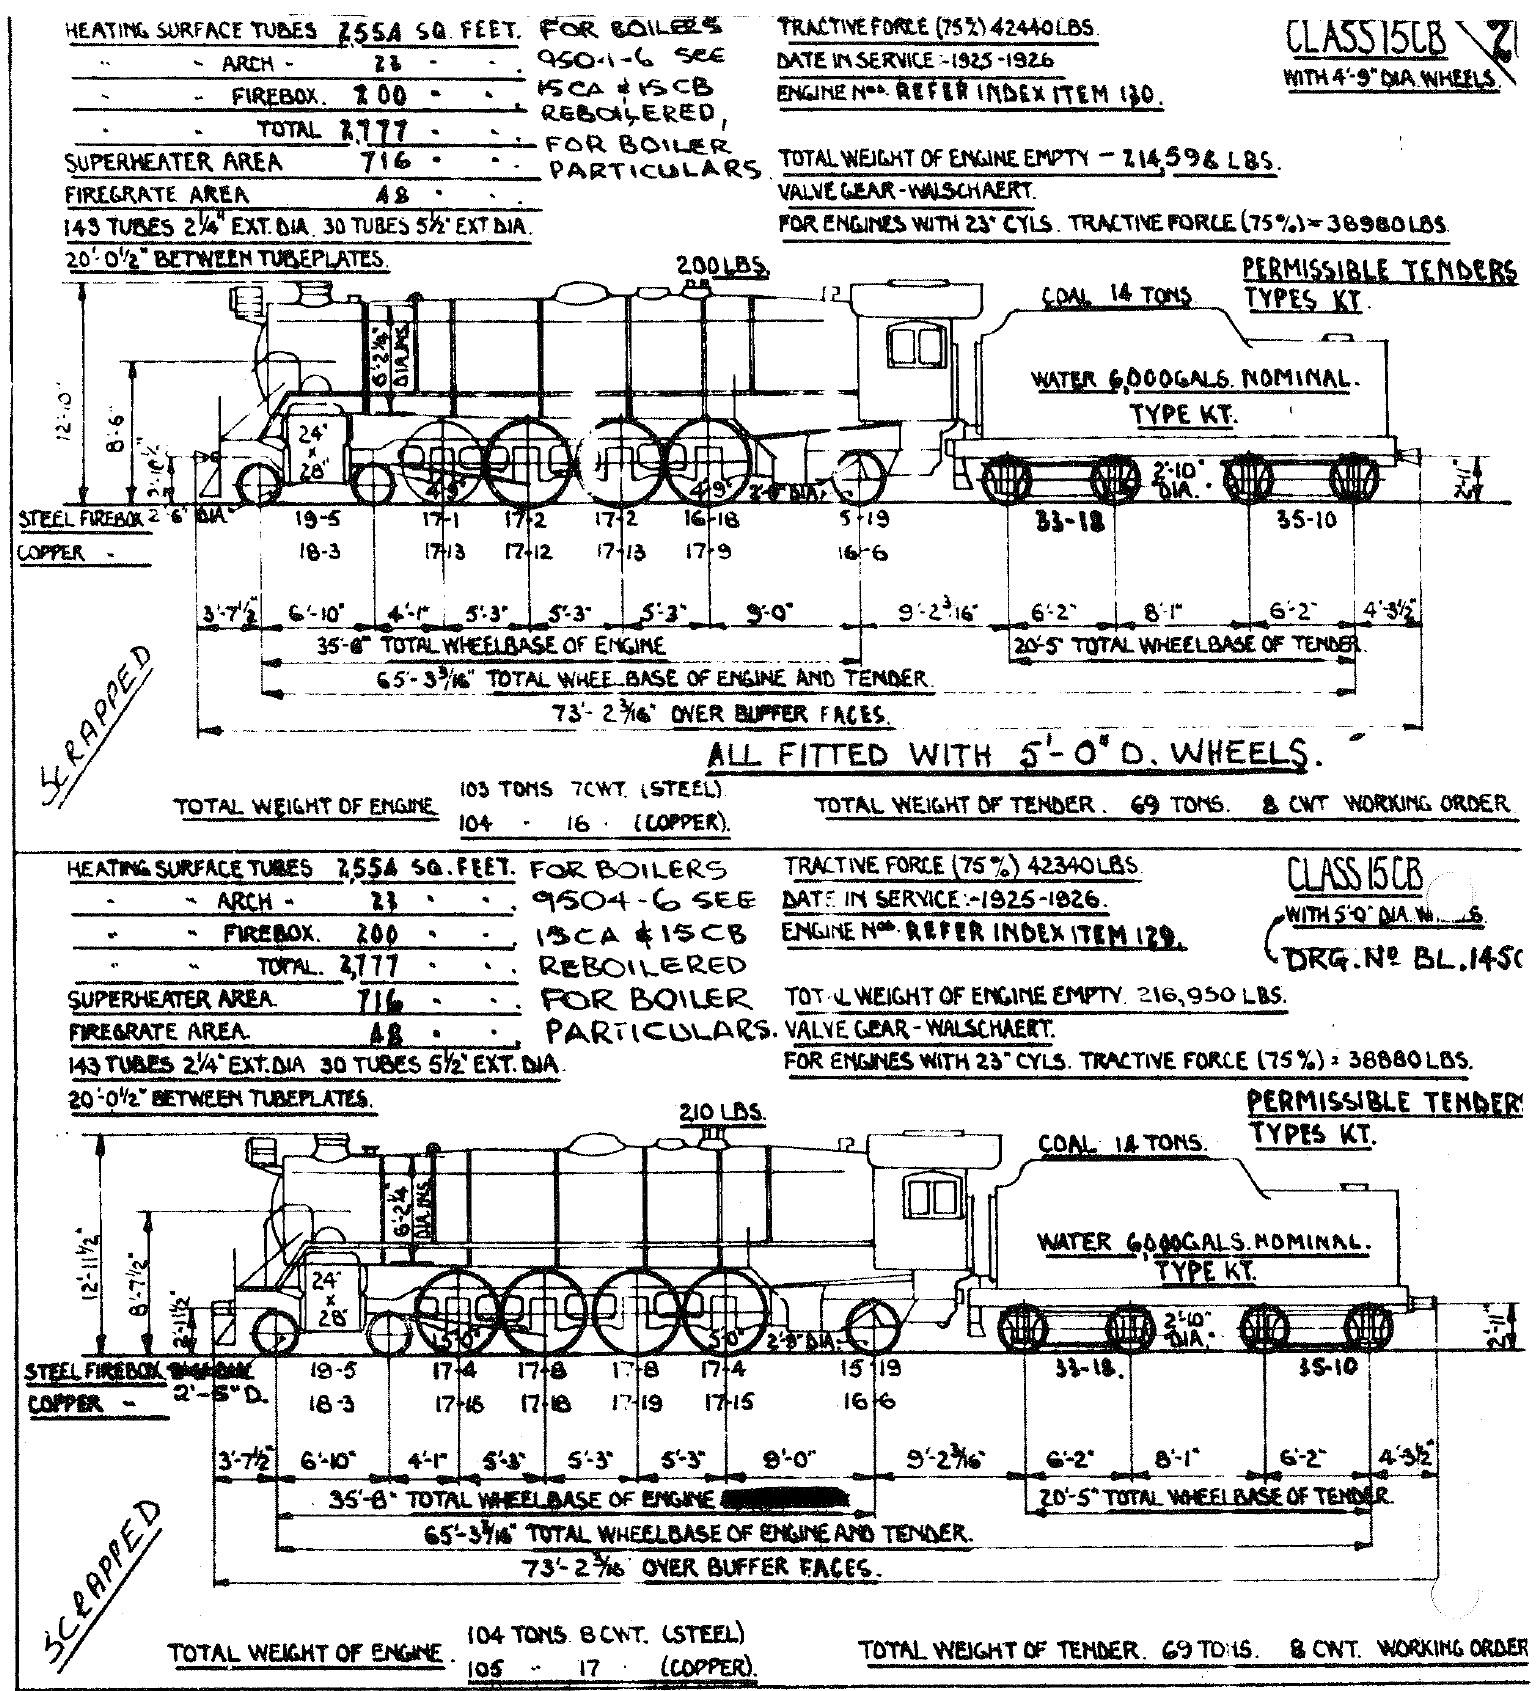 File Sar Class 15cb 4 8 2 Drawings